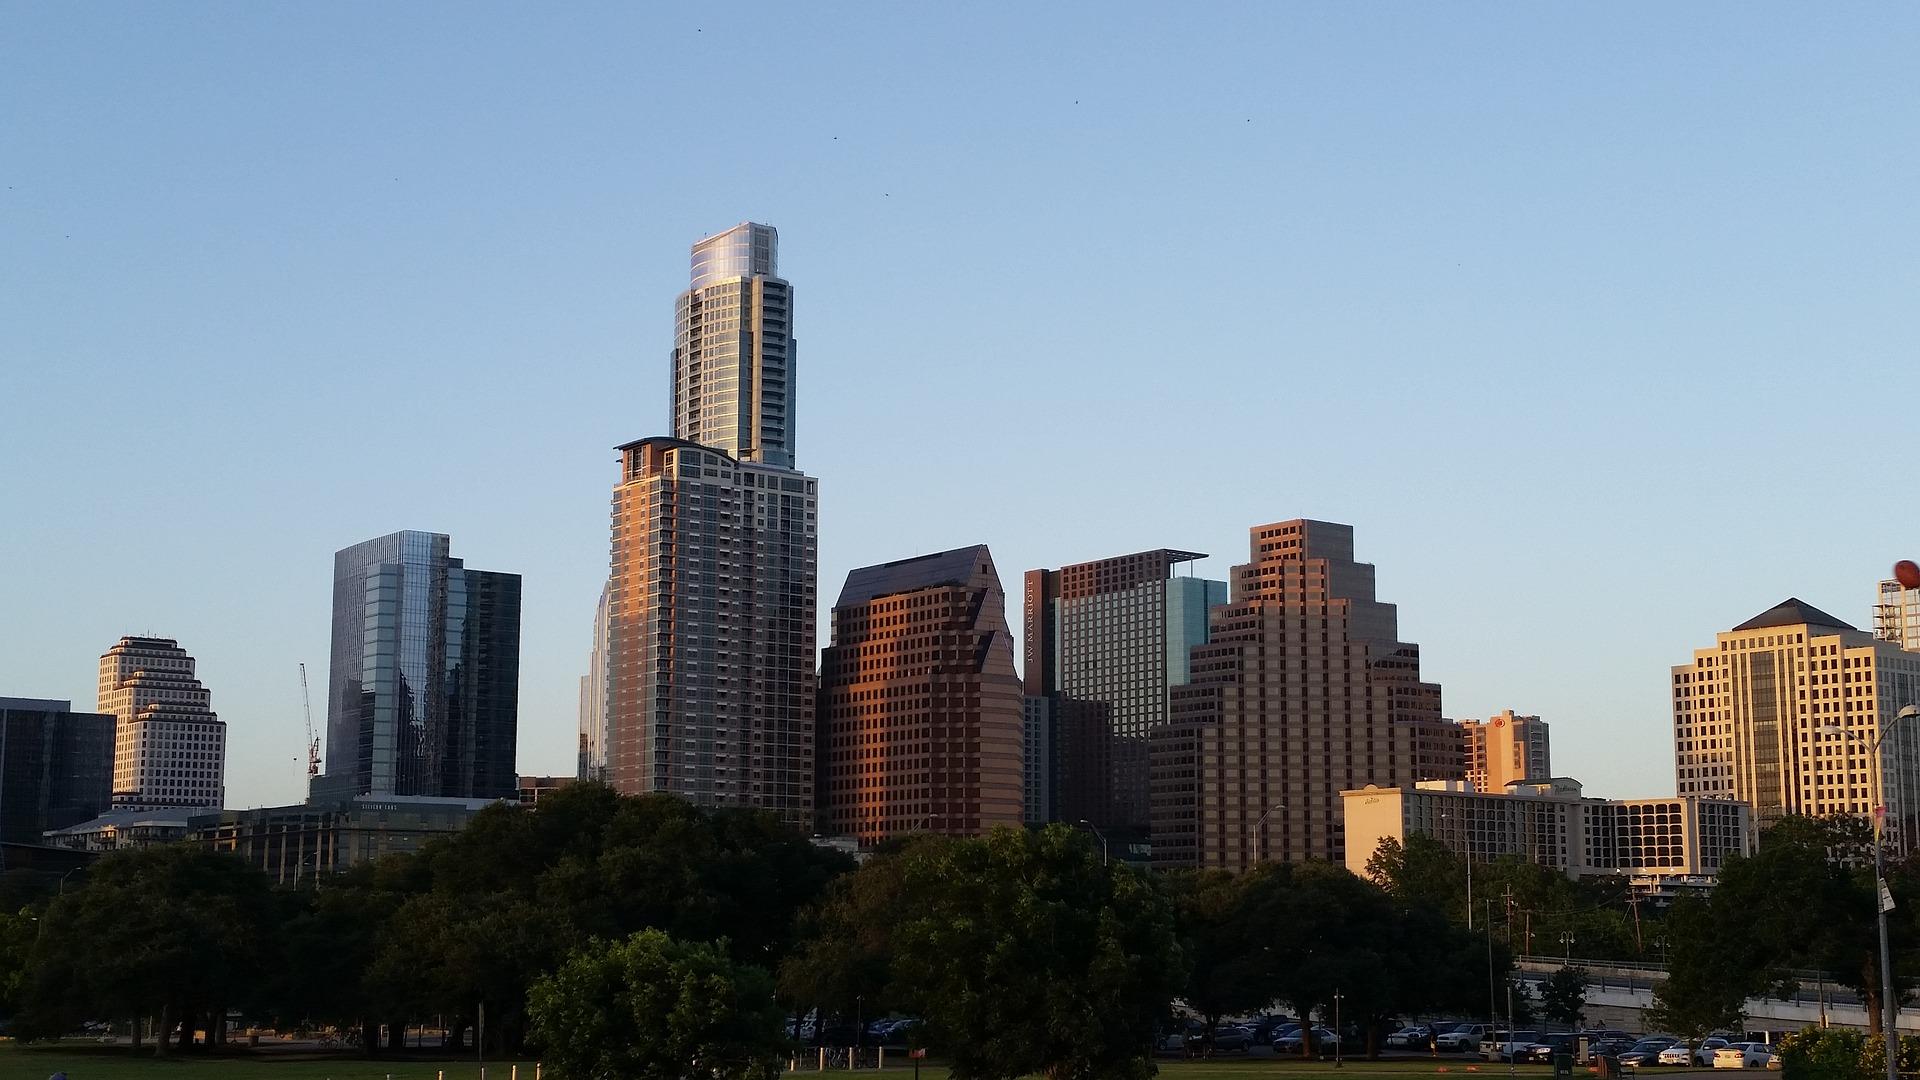 8 Reasons Austin's SXSW Festival Should Be on Every Film Buff's 2017 Bucket List